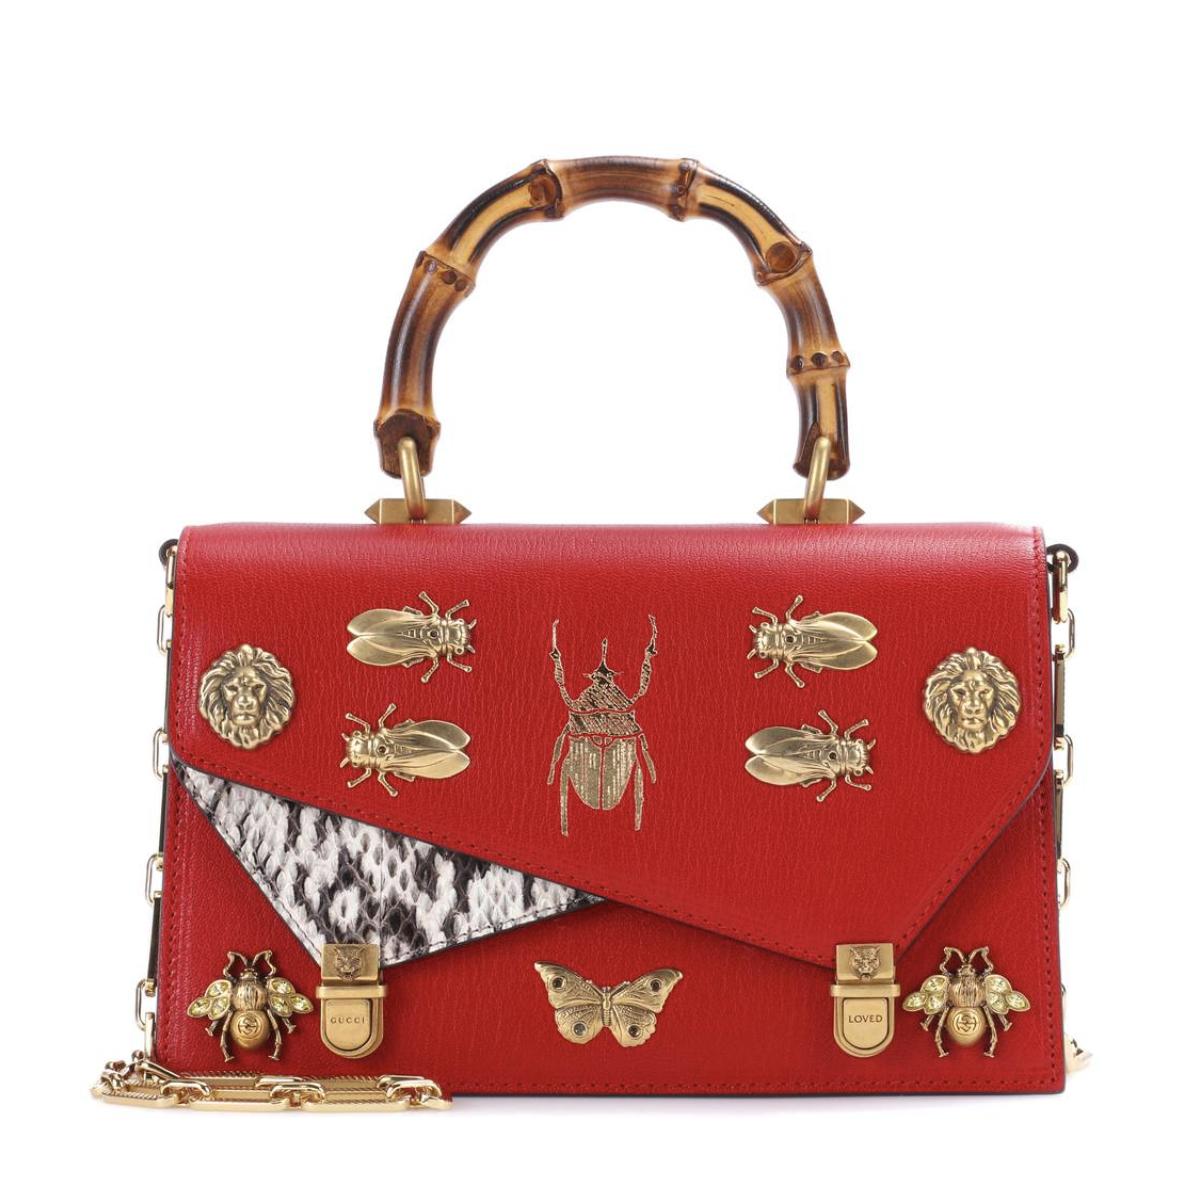 Ottilia Small leather shoulder bag